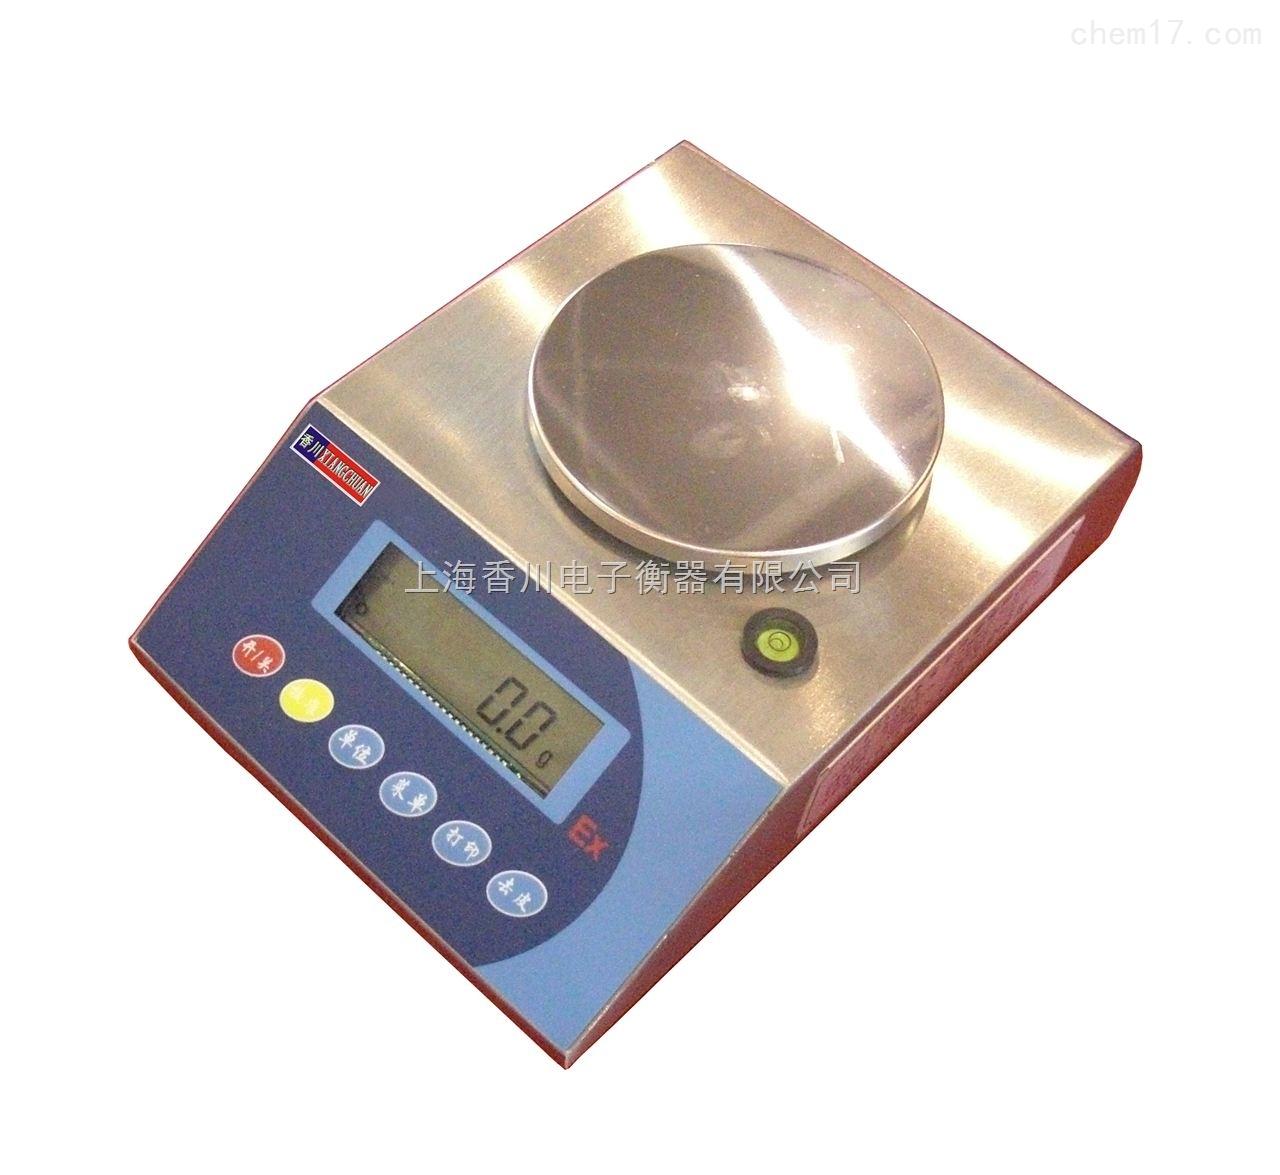 tcs-xc-ex 本安型电子台秤的价格